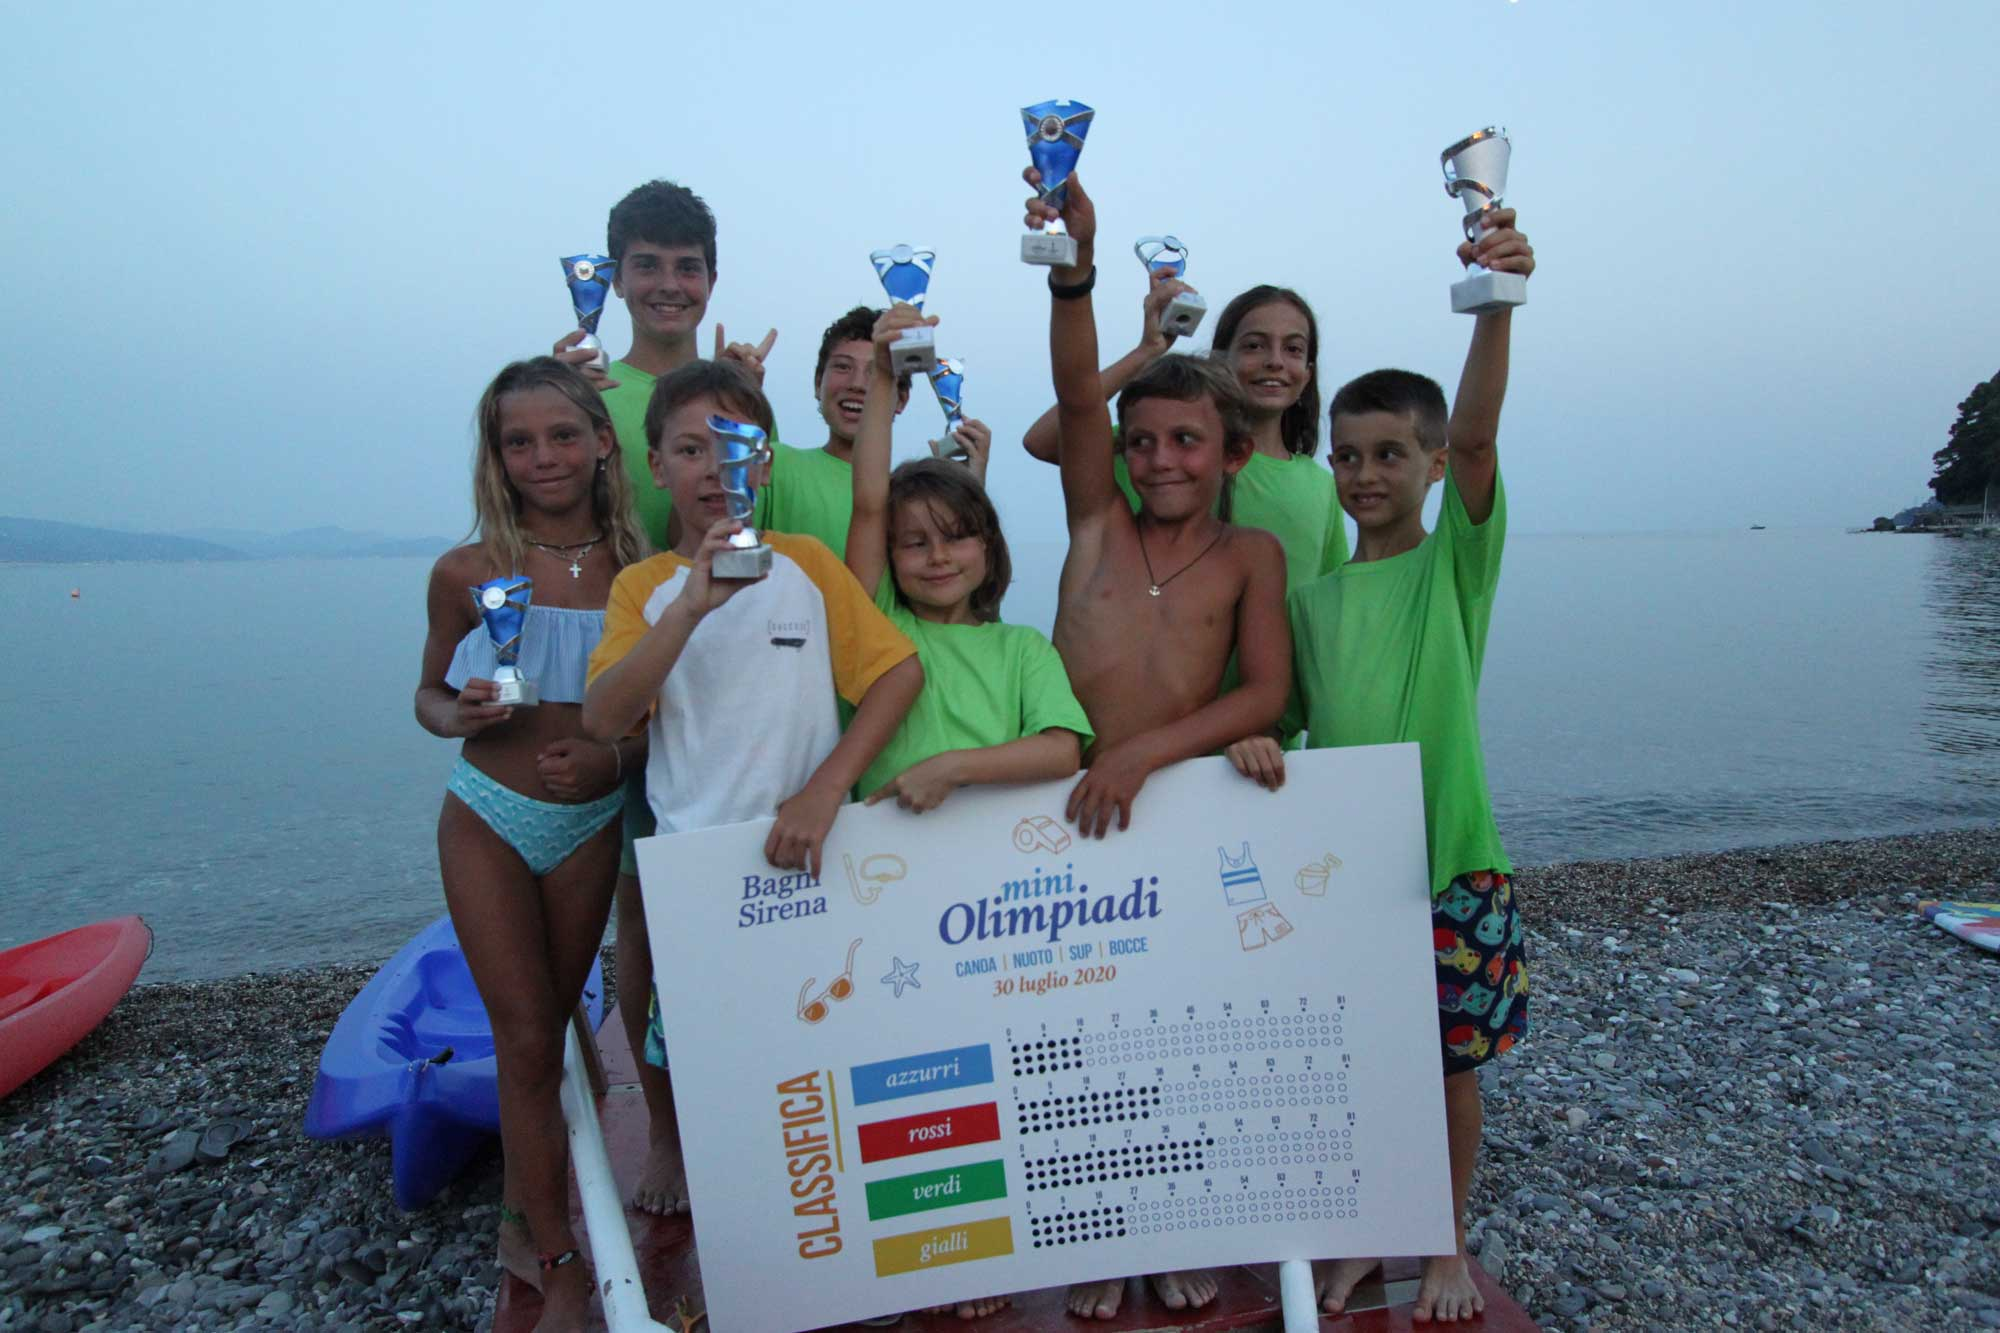 Vincitori mini olimpiadi - Bagni Sirena 2020